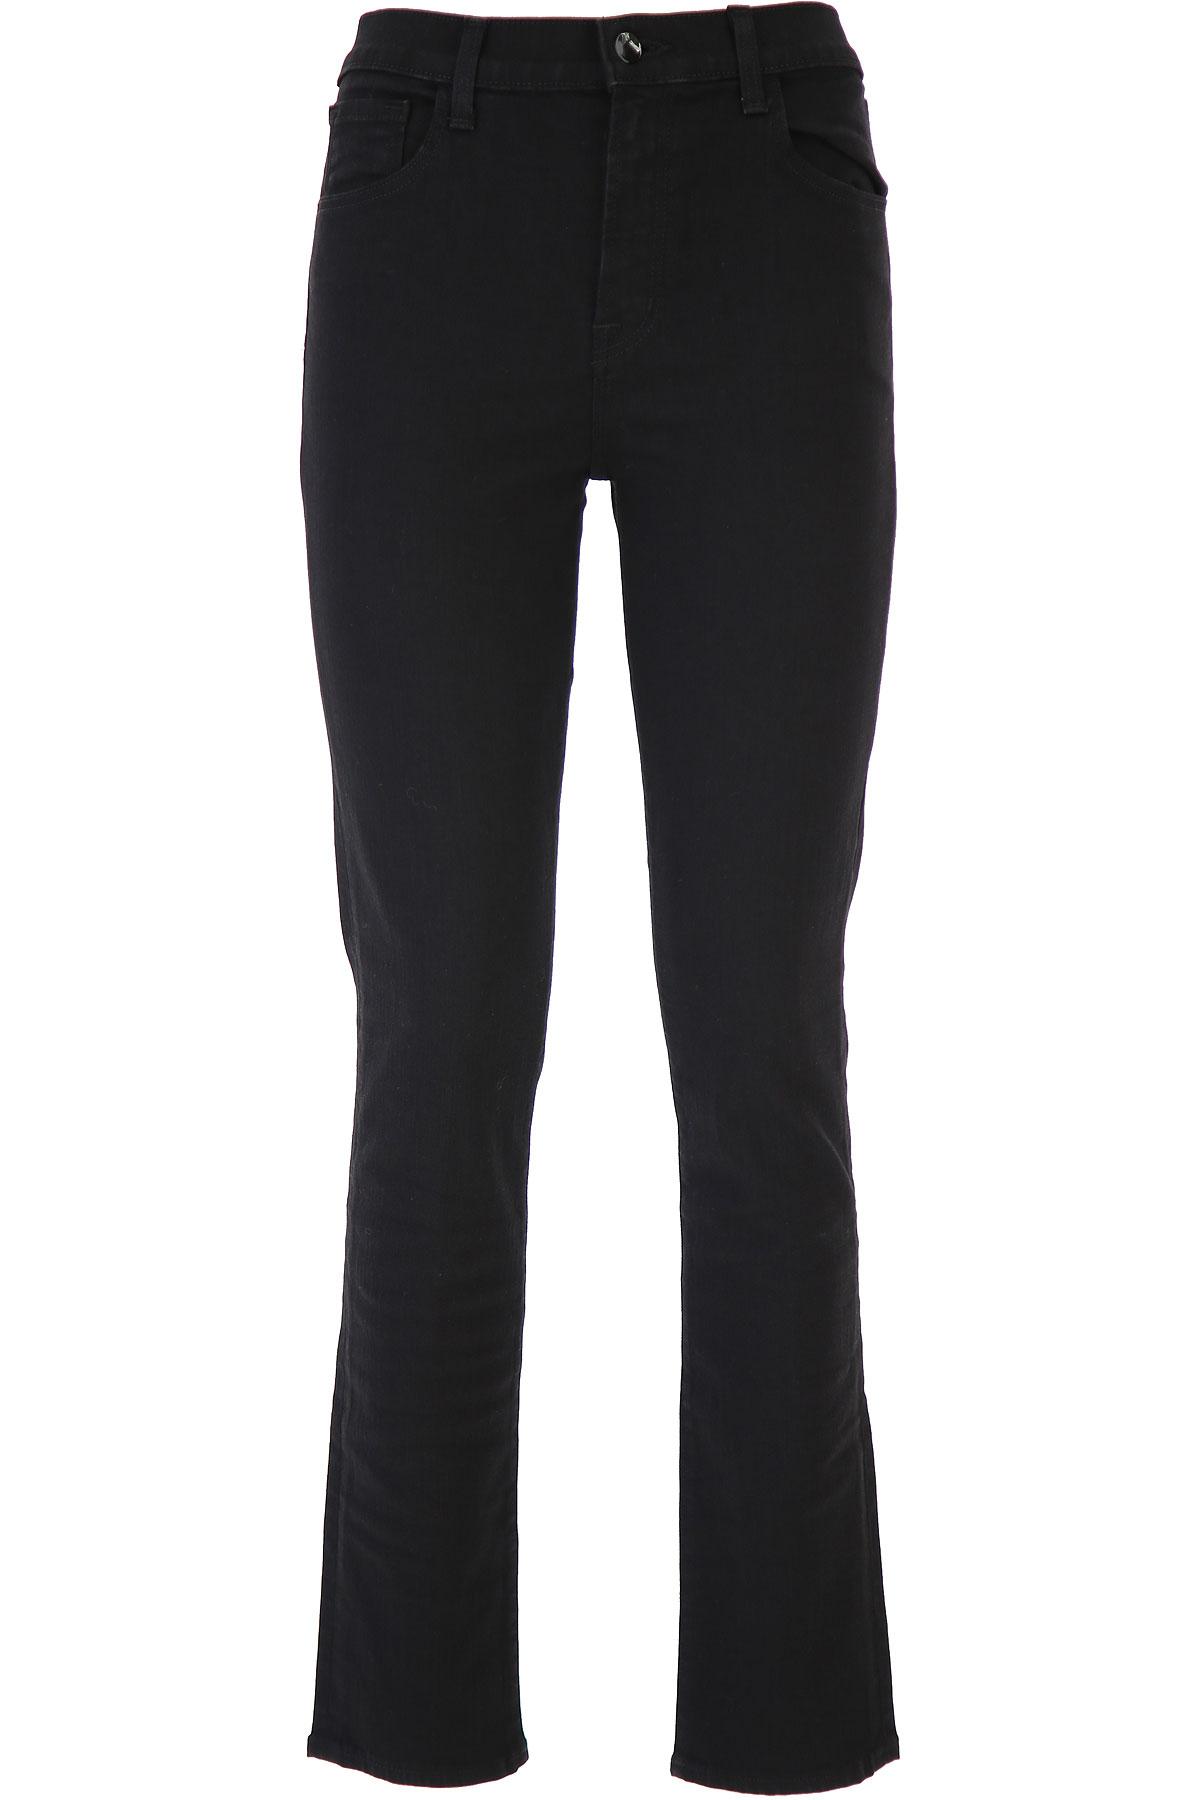 J Brand Jeans On Sale, Black, Cotton, 2019, 26 27 28 29